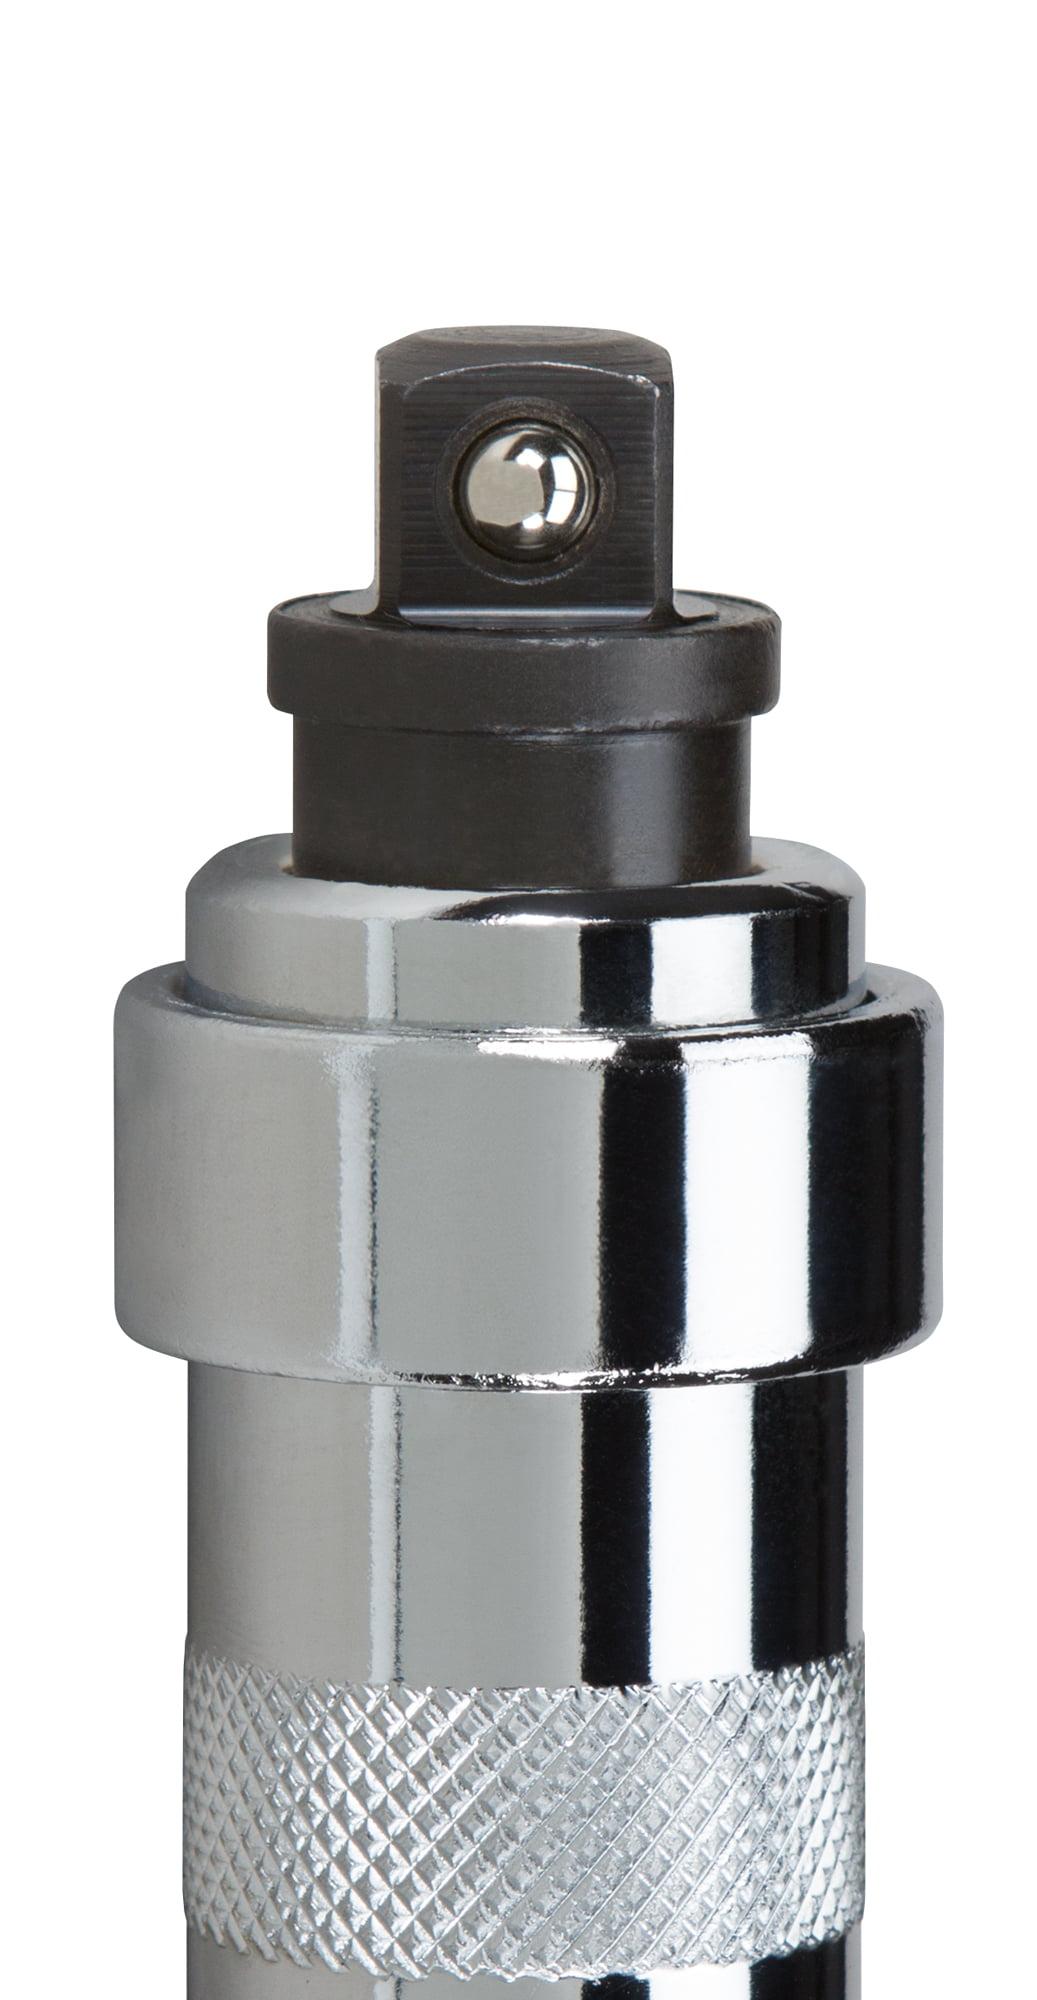 7-Piece TEKTON 2910 1//2-Inch Drive Manual Hand Impact Driver Set